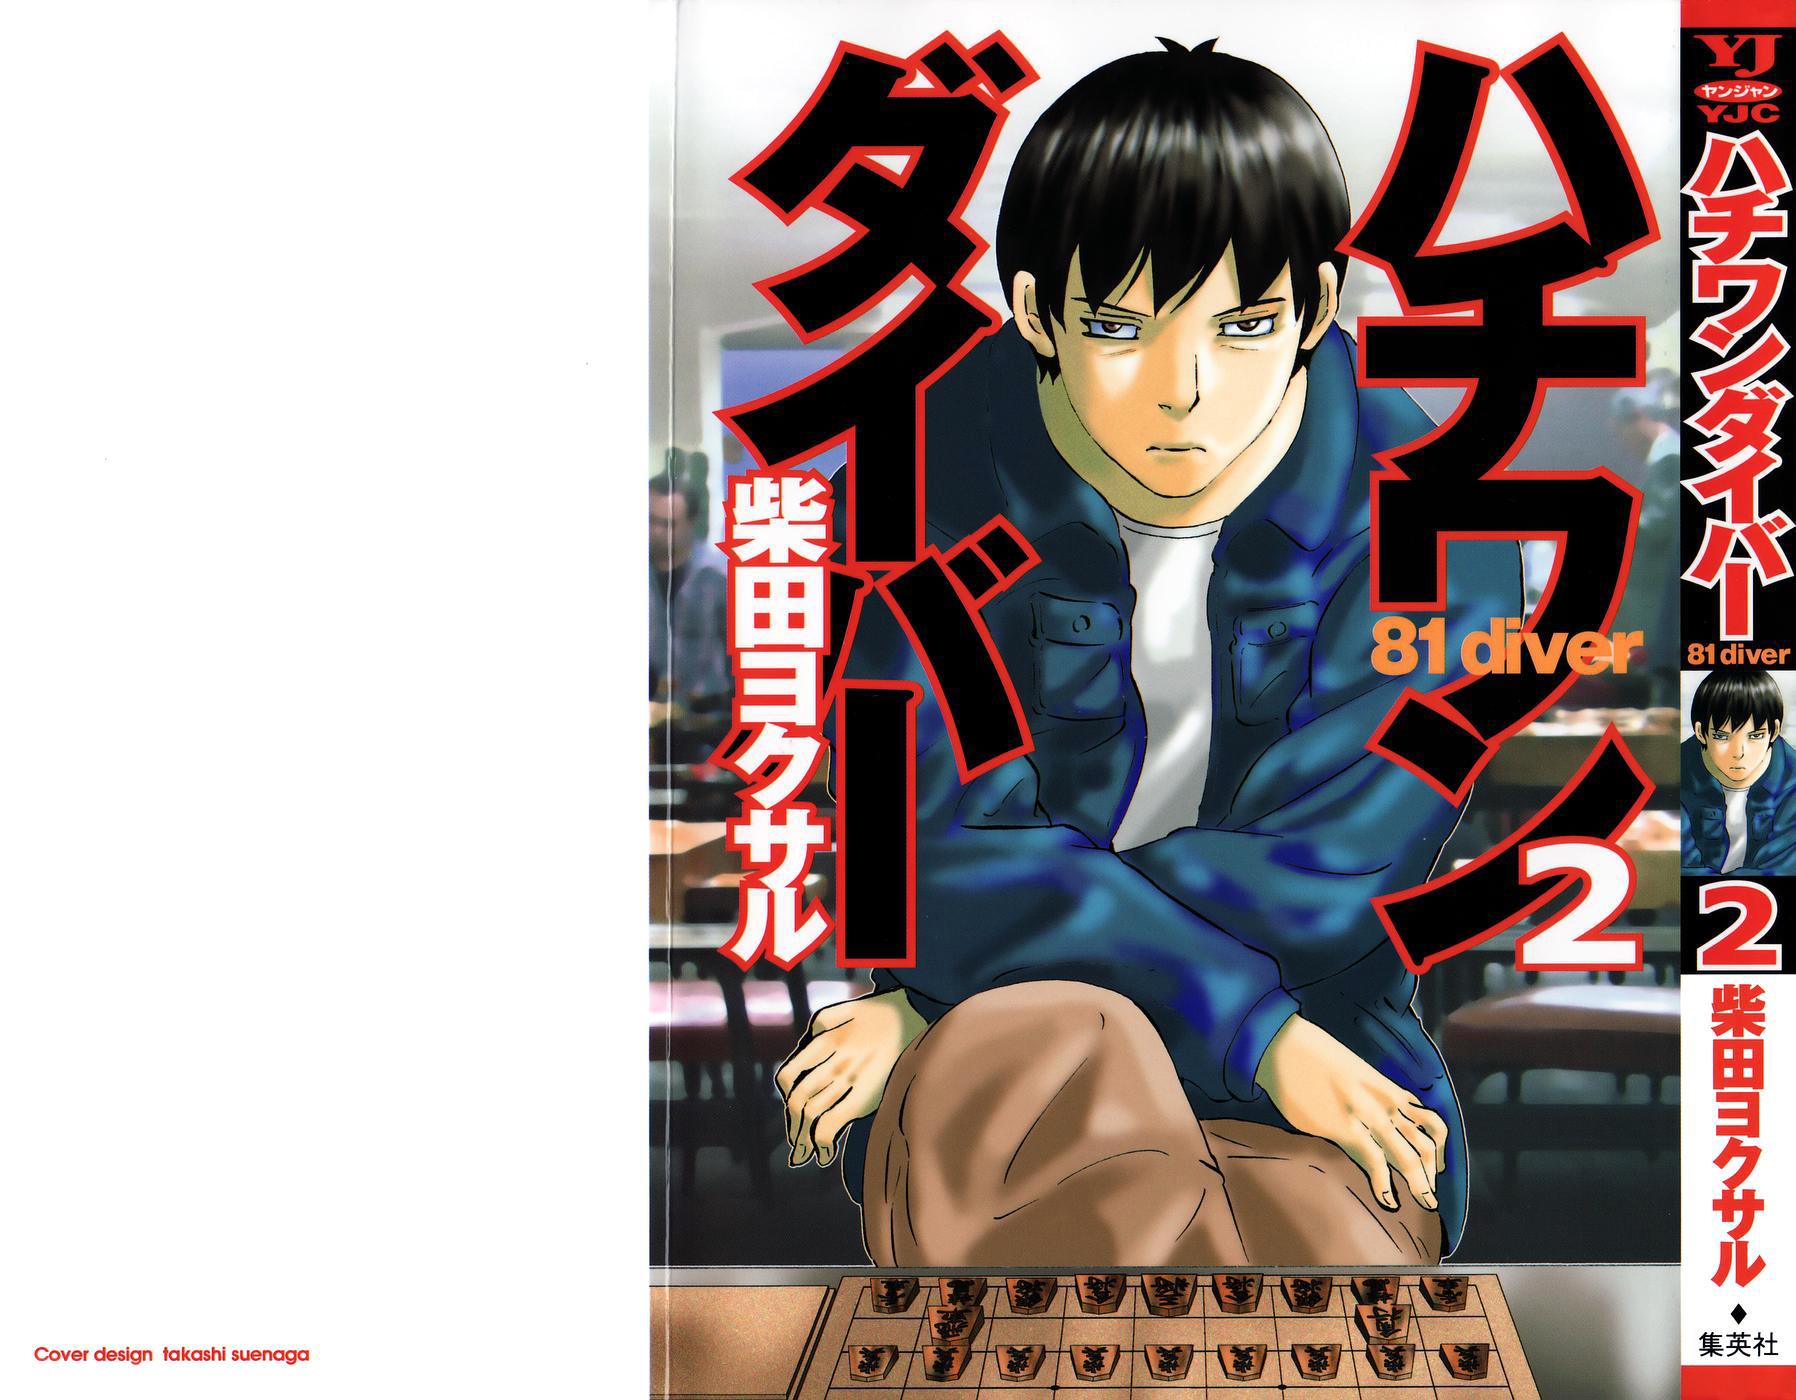 81diver - Goshujin-sama's Growth. - 2